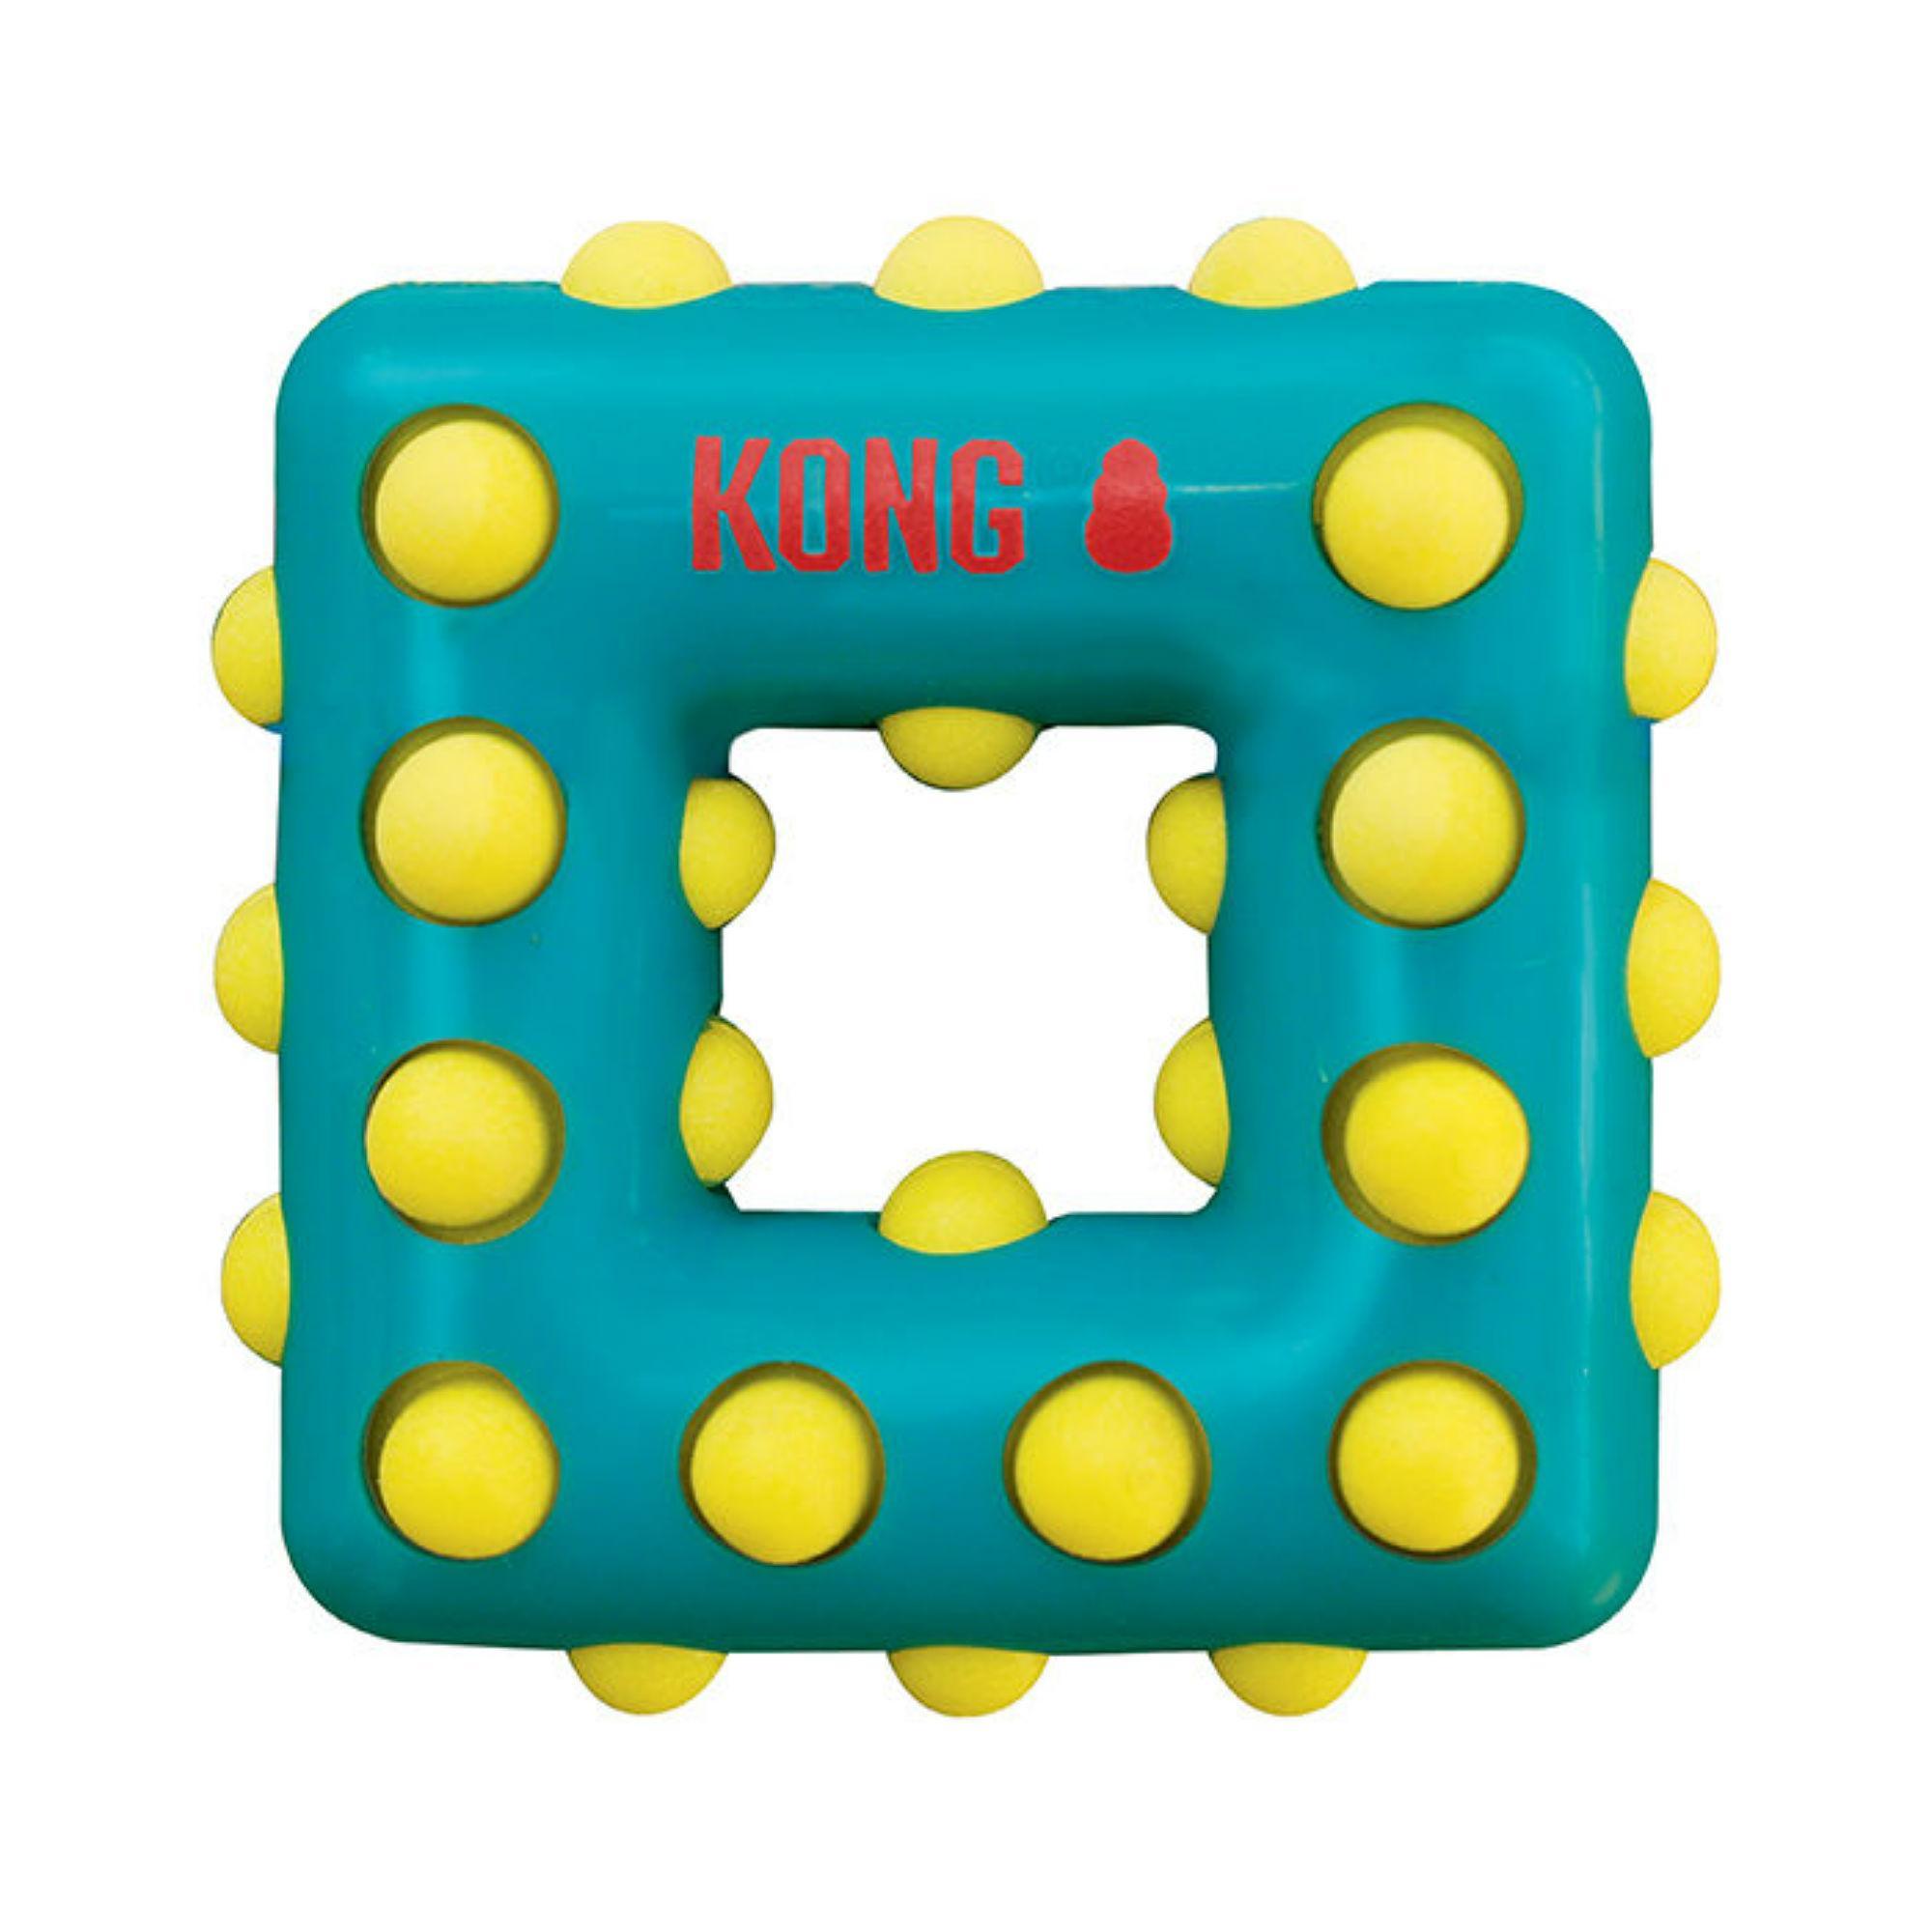 KONG Dotz Dog Toy - Square